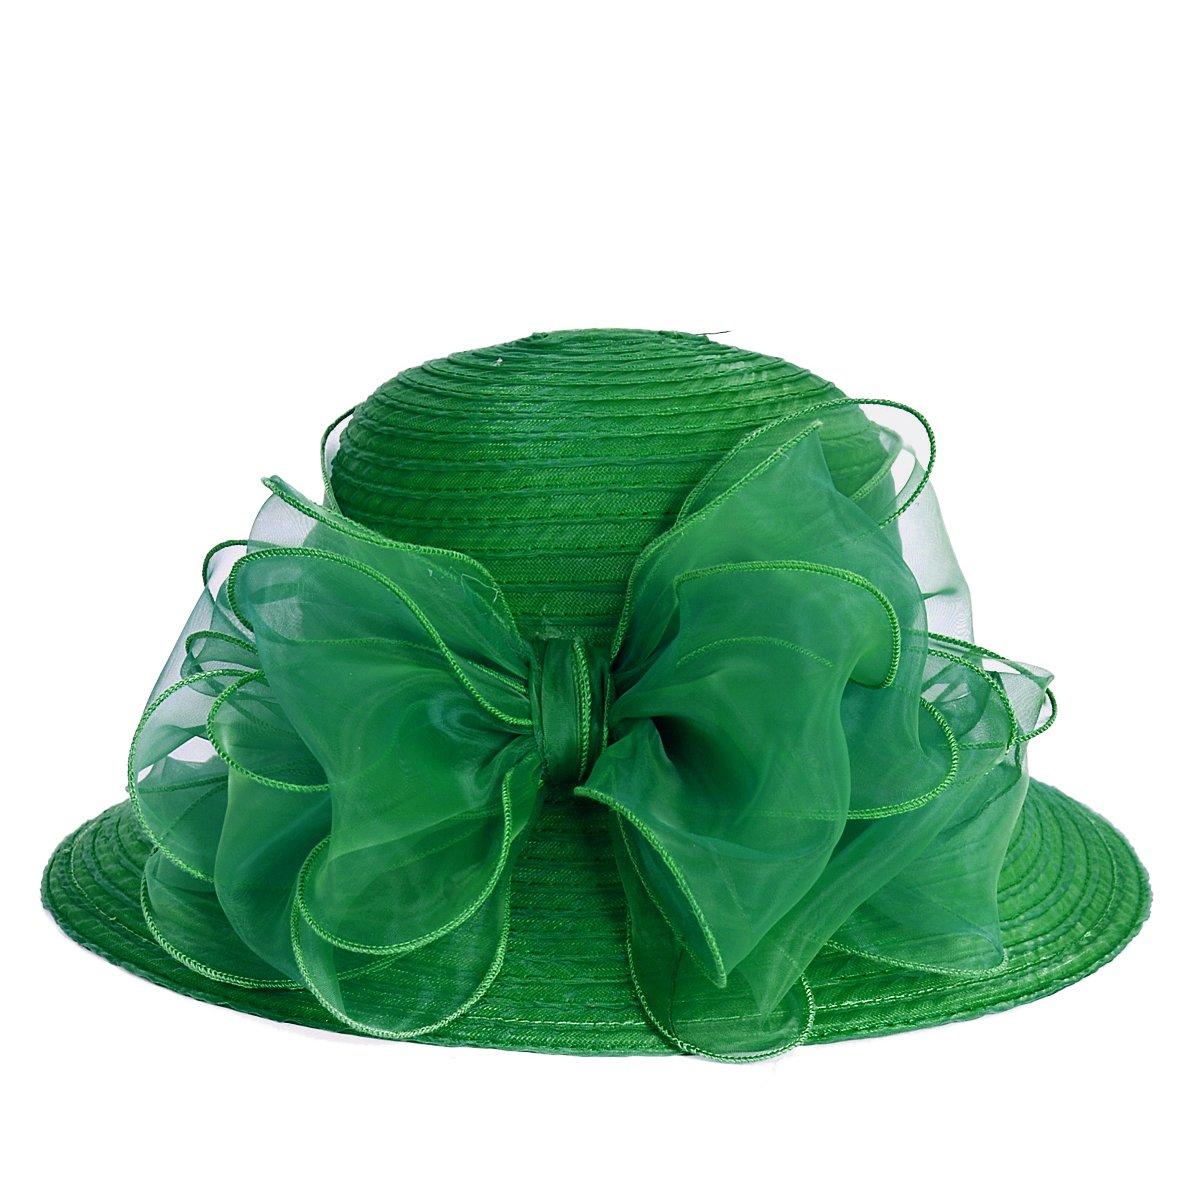 VECRY Lady Derby Dress Church Cloche Hat Bow Bucket Wedding Bowler Hats (Green, Medium) by VECRY (Image #2)